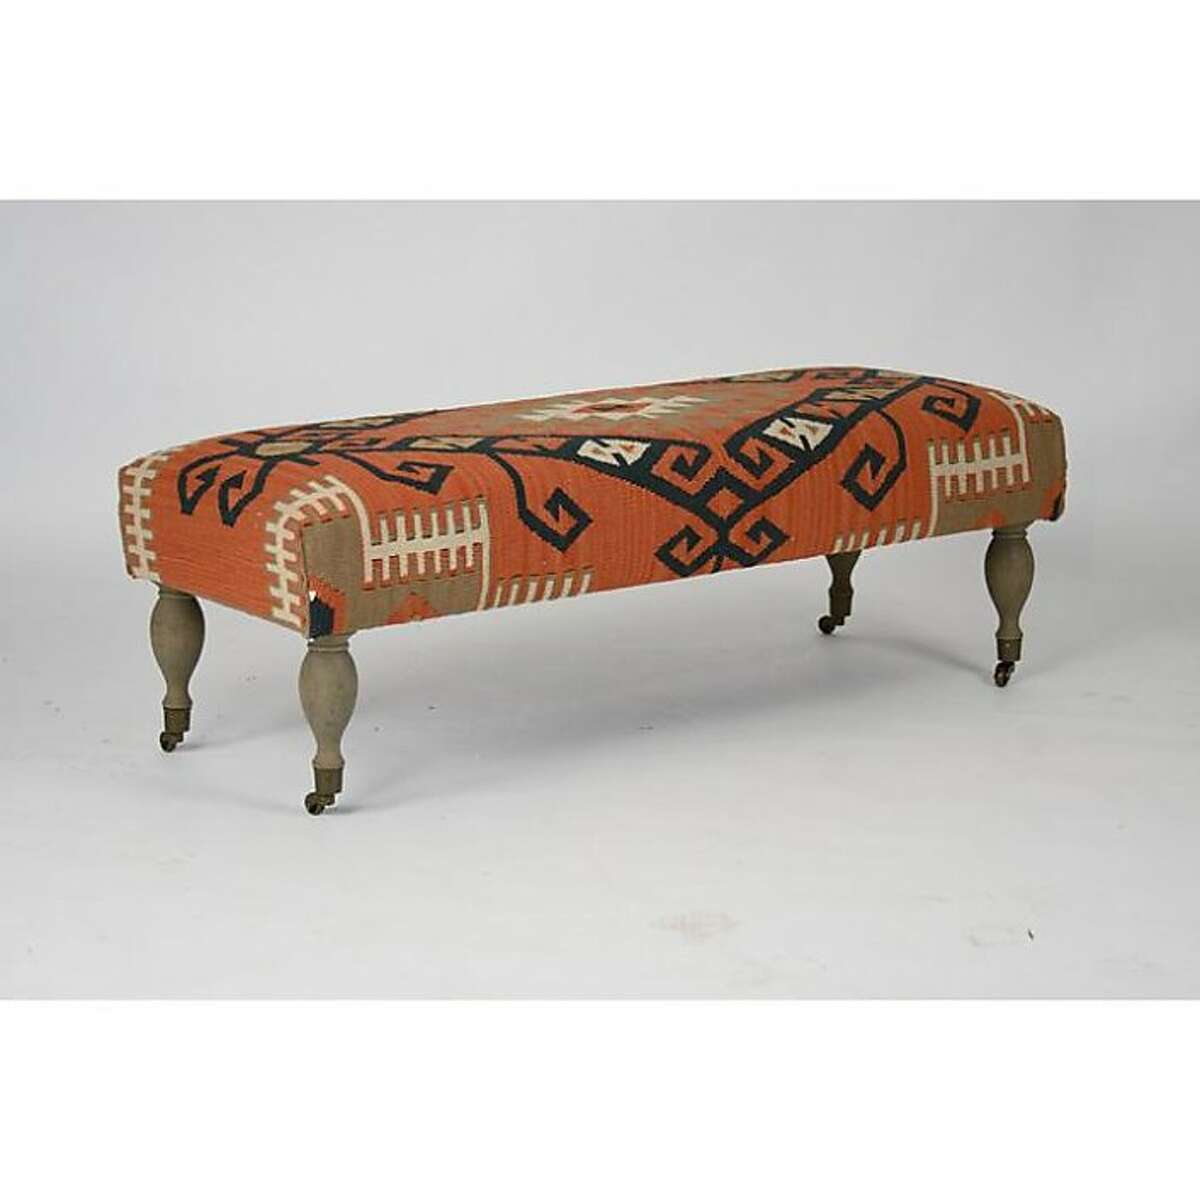 $1,249: Zentique Kilim Bench-Red from Candelabra (shopcandelabra.com)